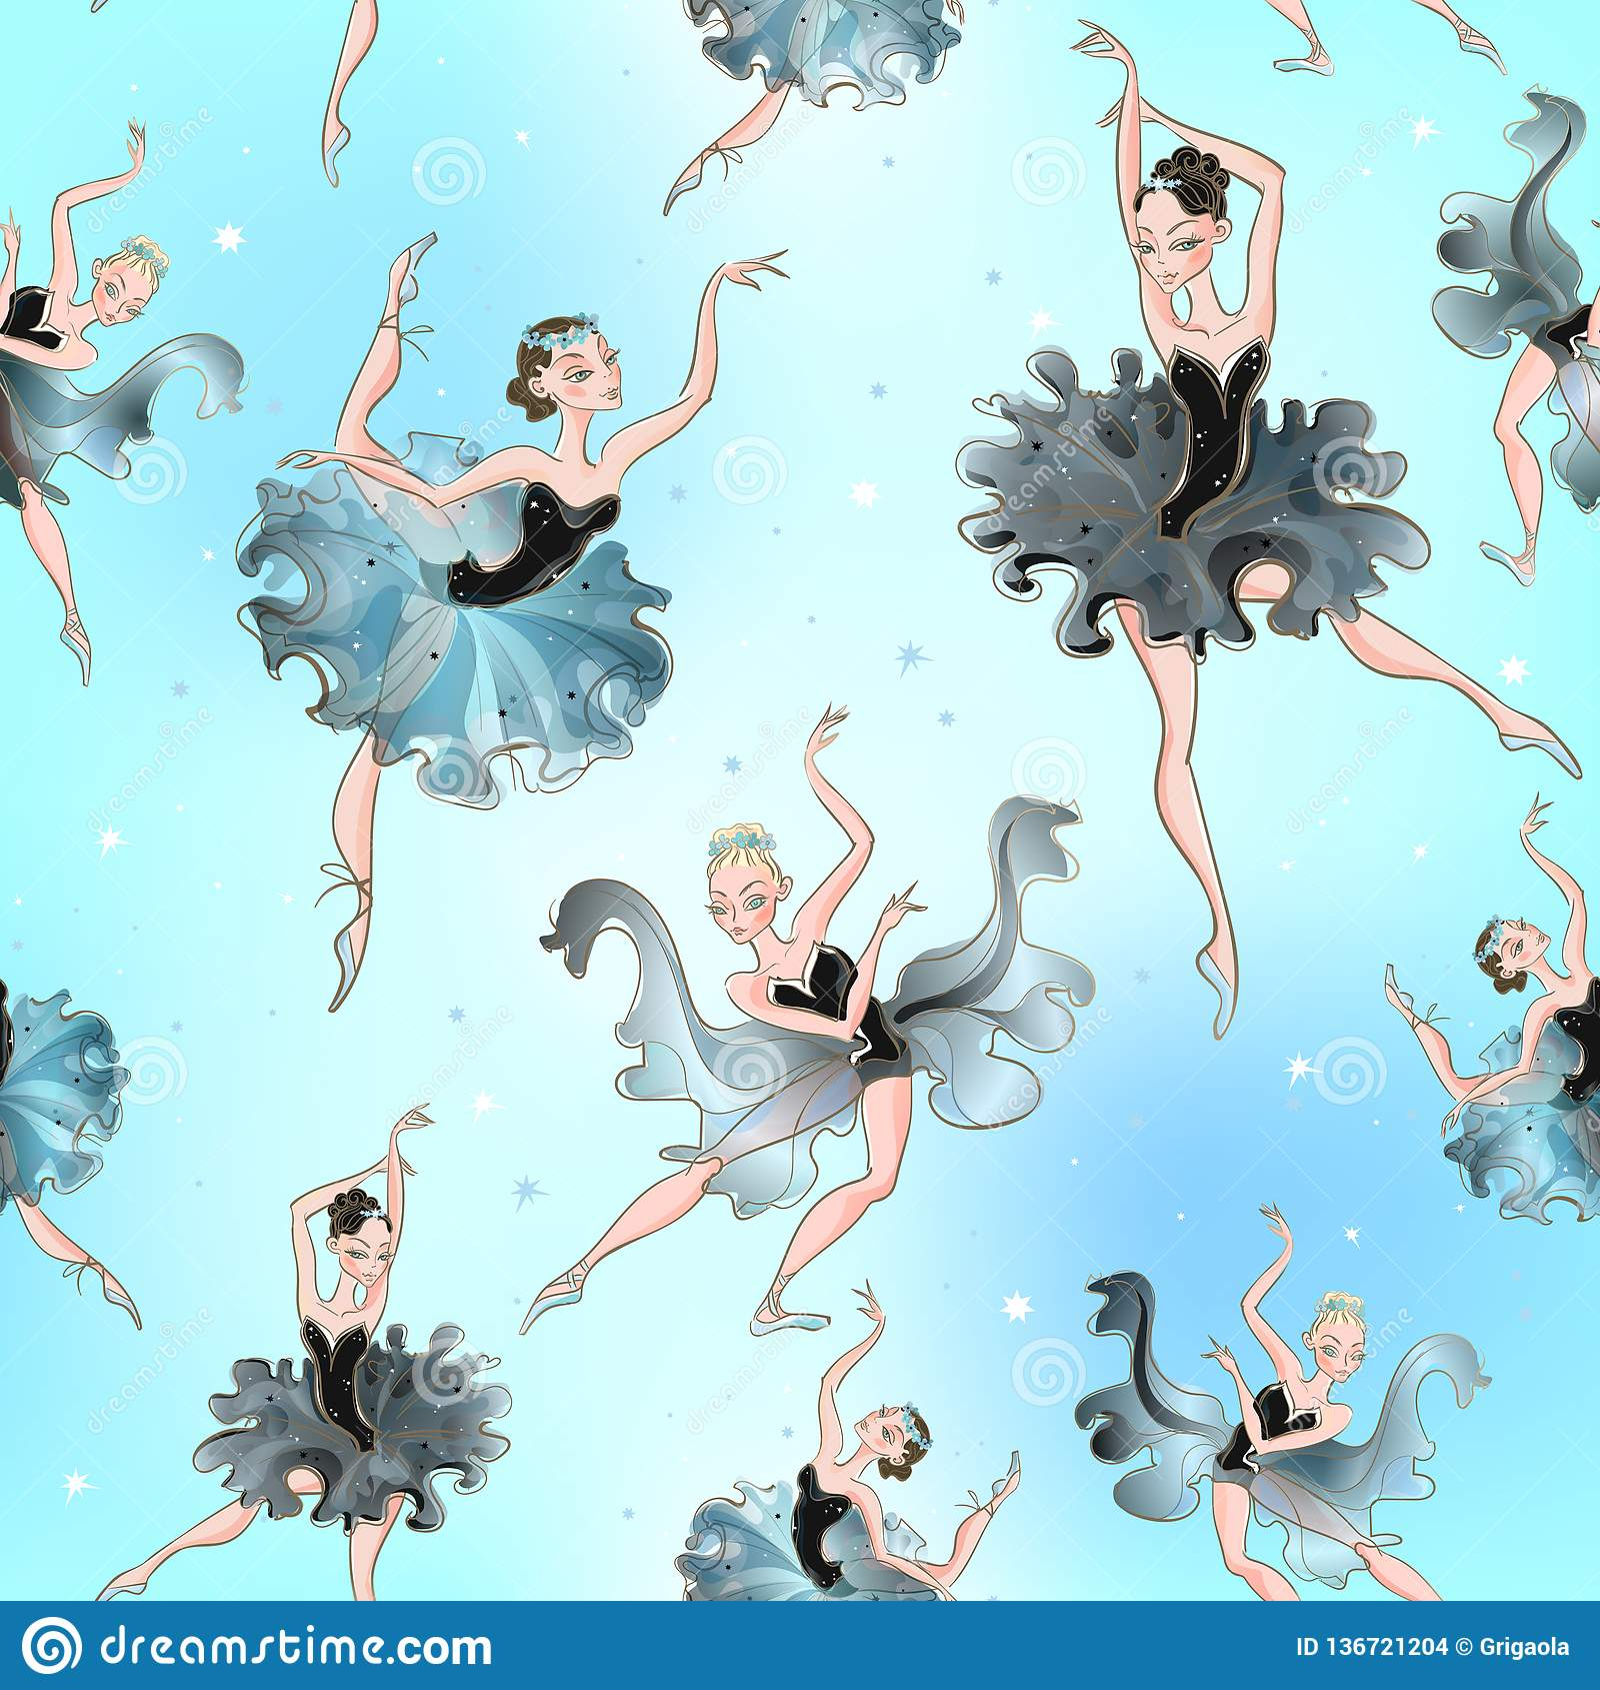 07c962a1ccd μπαλέτα Στοκ Εικονογραφήσεις, Vectors, & Clipart – (317 Στοκ  Εικονογραφήσεις)